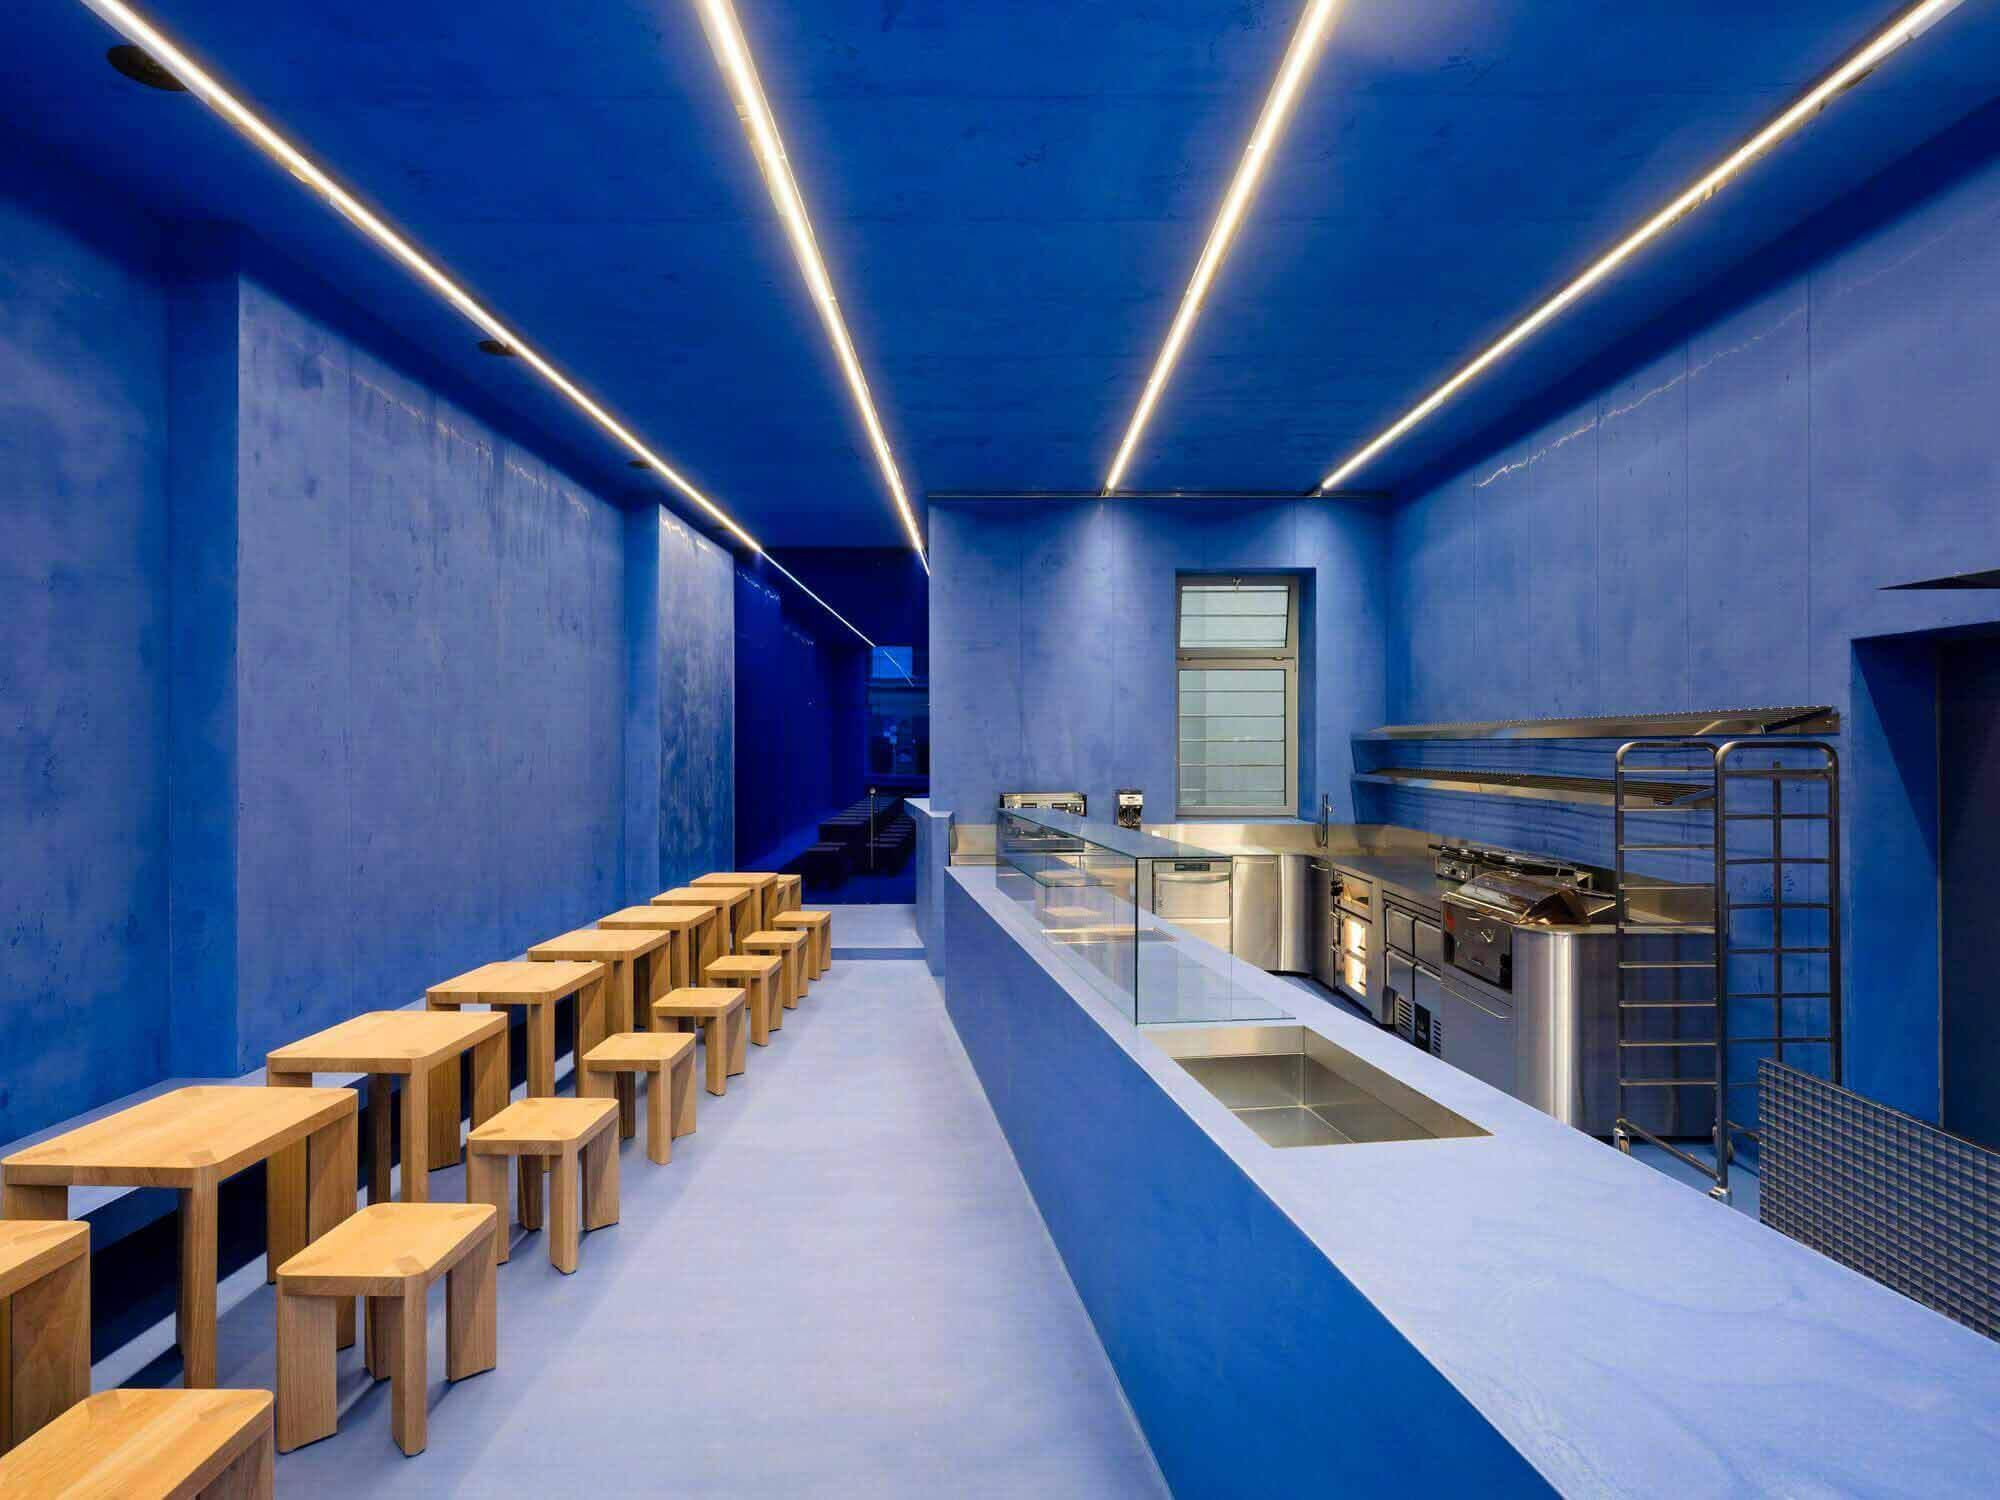 Пекарня Aera / Gonzalez Haase Architects